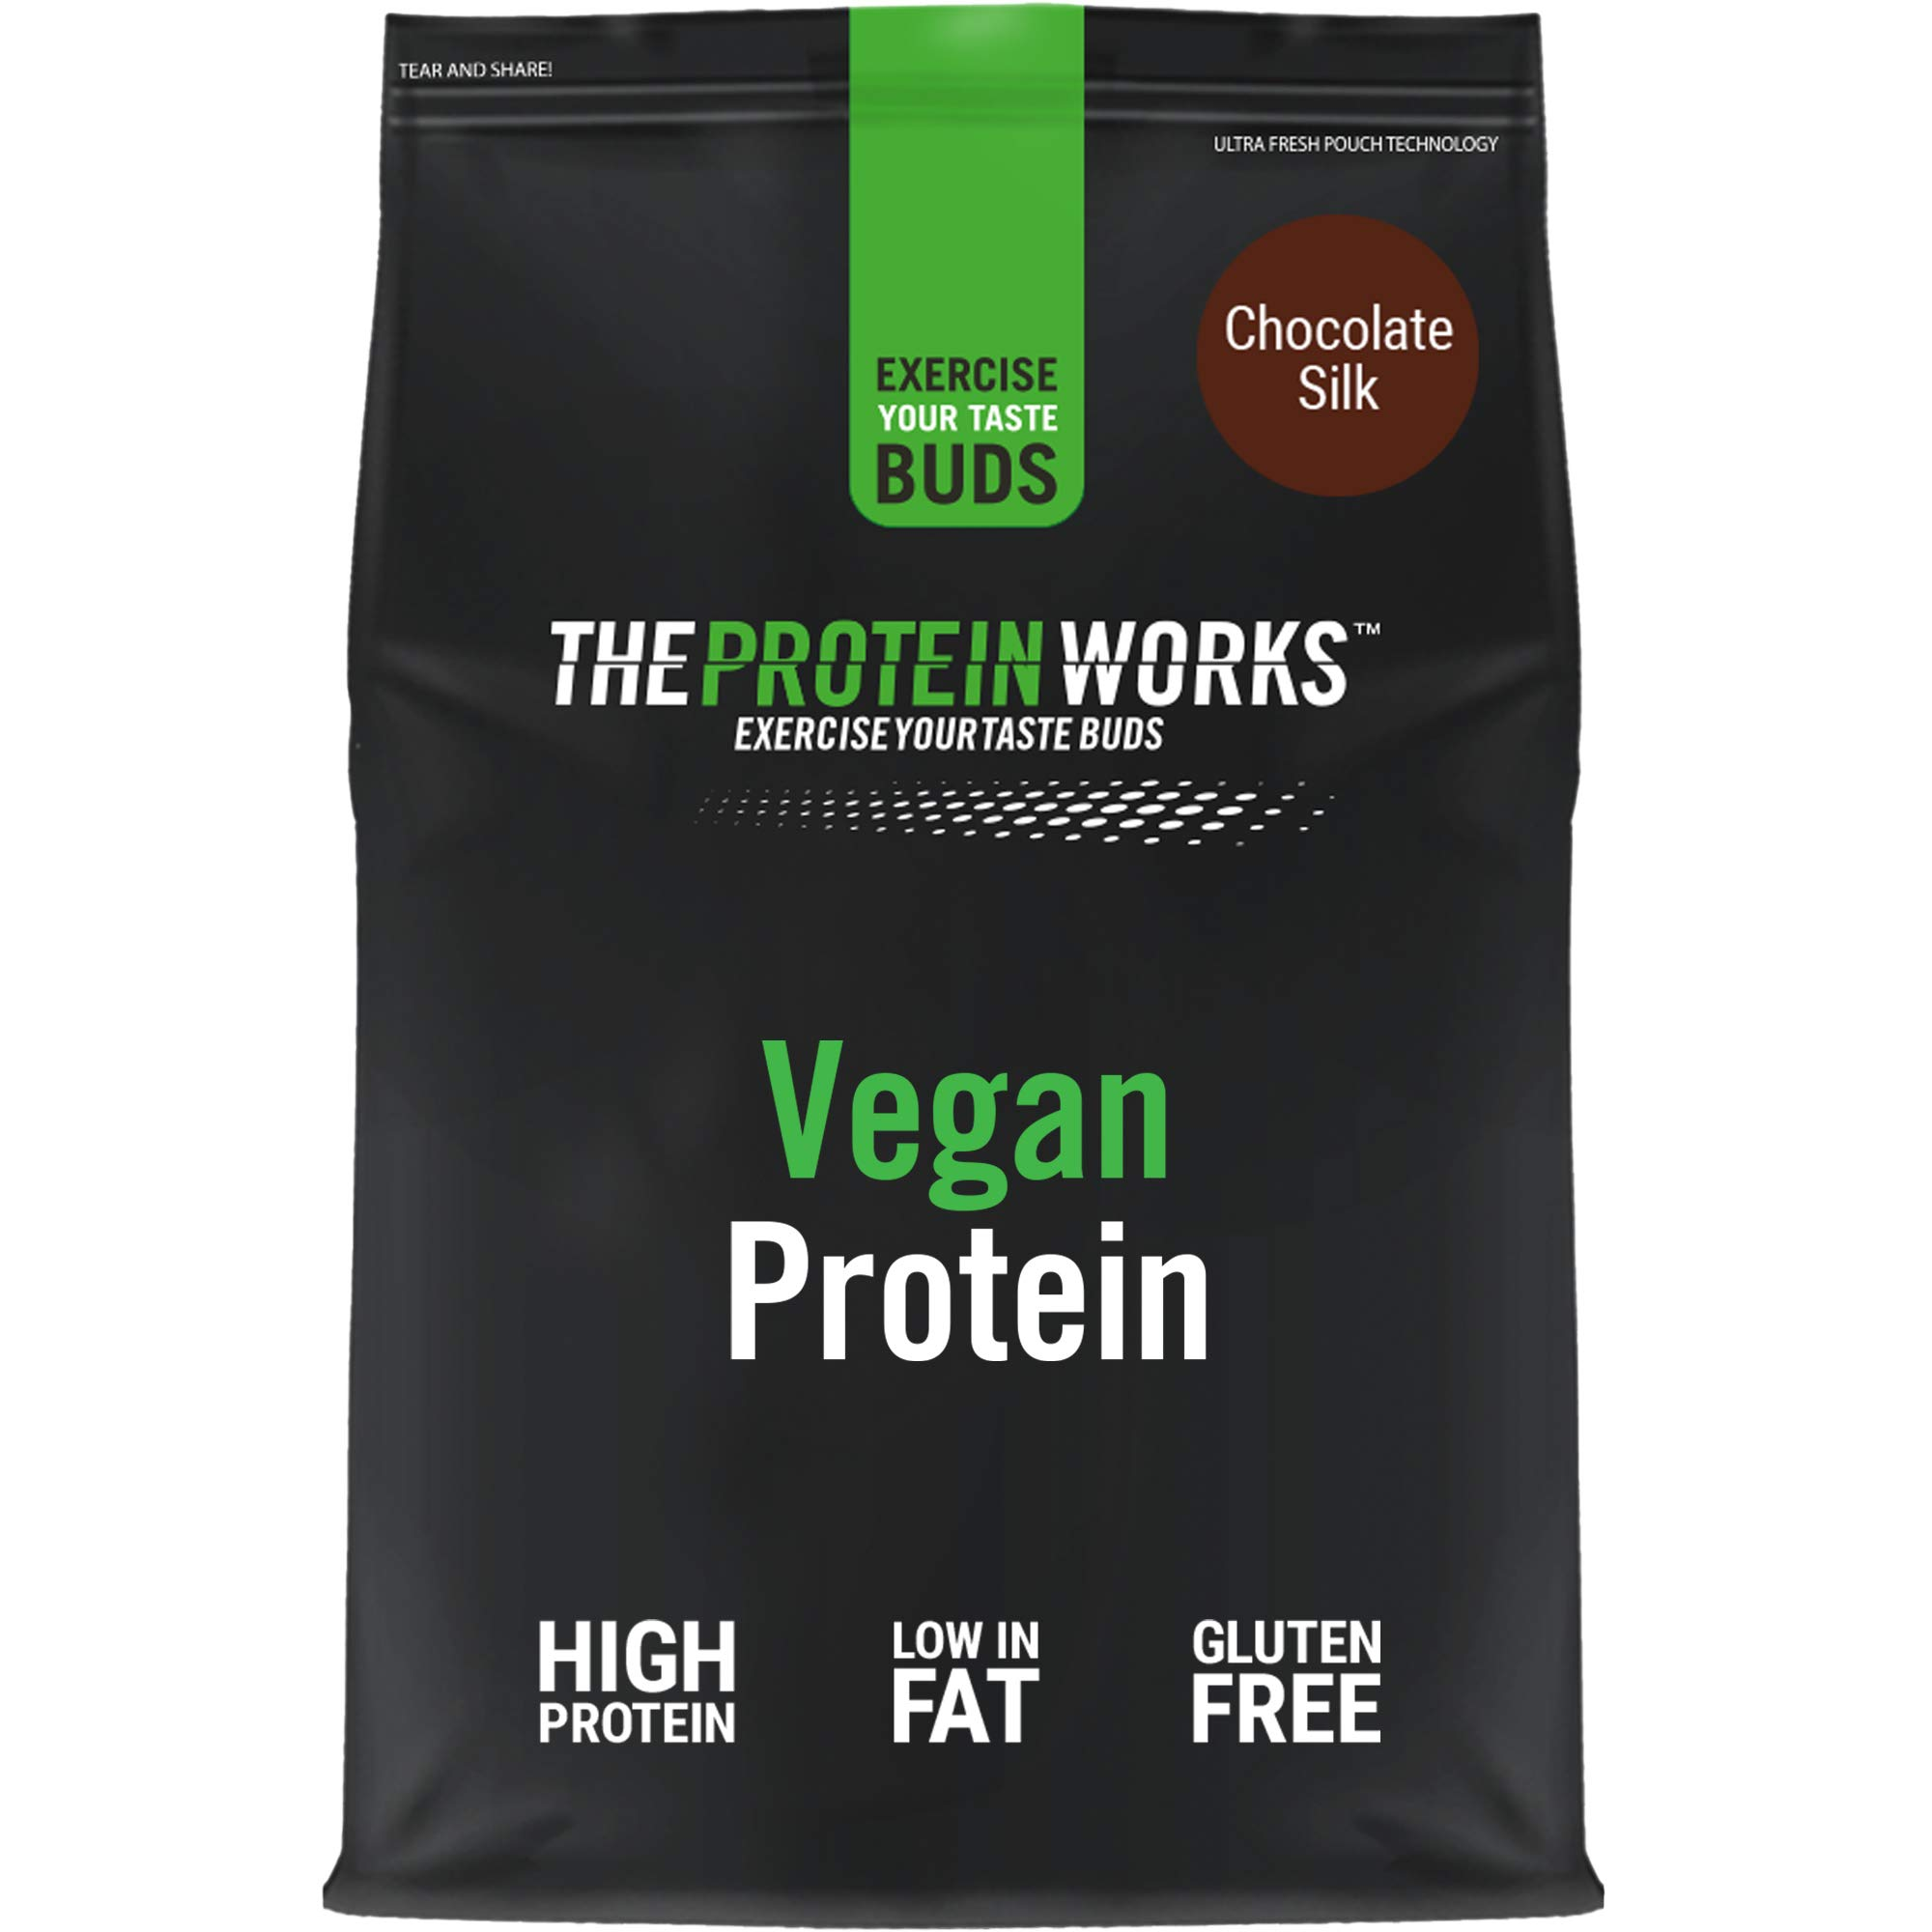 Vegan Protein Powder | 100% Plant-Based & Natural | Gluten-Free | Zero Cruelty | Low Fat Shake | THE PROTEIN WORKS | Chocolate Silk | 1 Kg